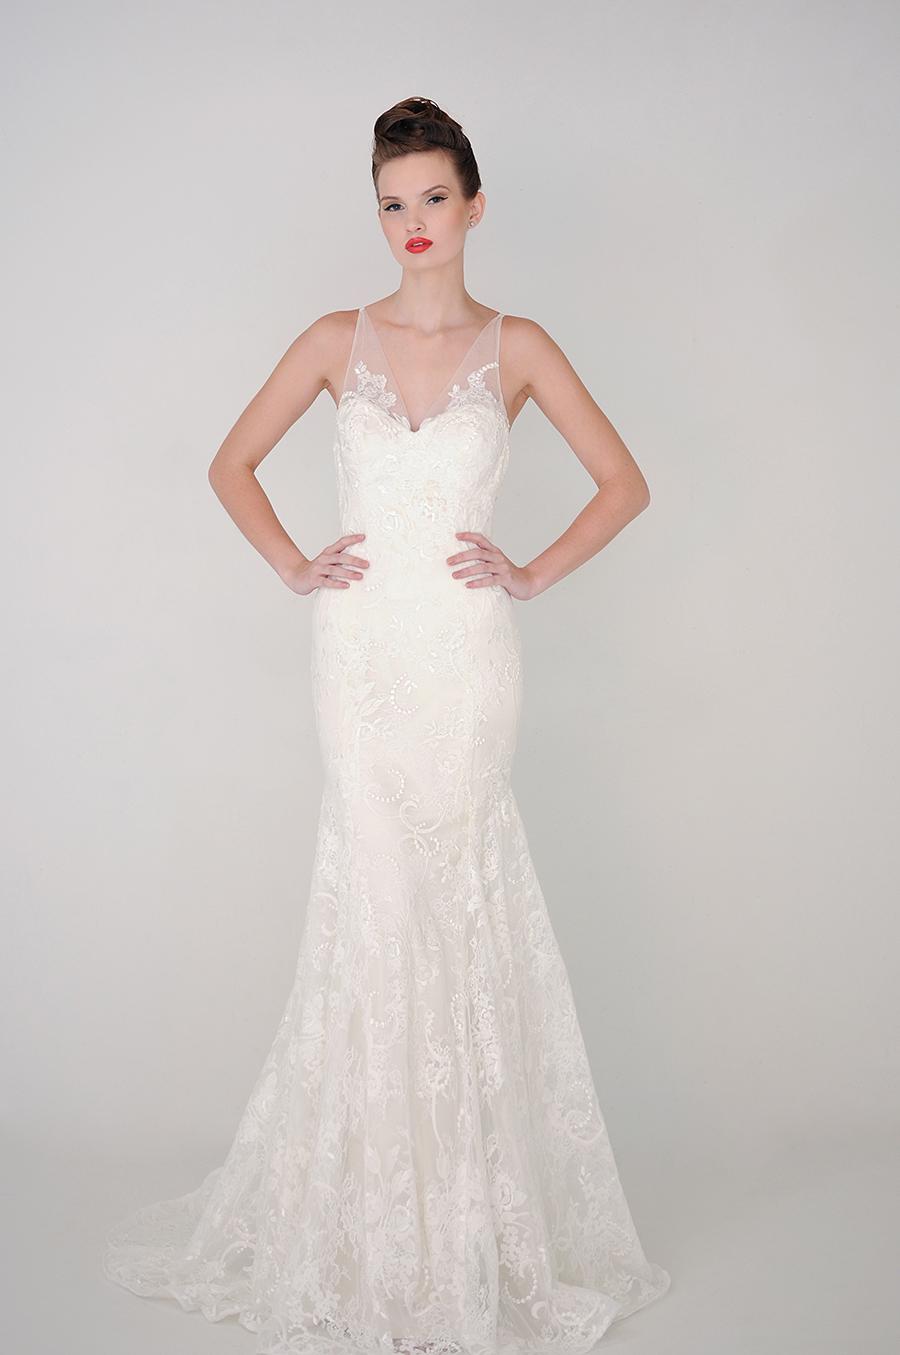 http://www.aislestyle.co.uk/exquisite-sheath-v-neck-lace-patterns-tulle-wedding-dress-p-195.html